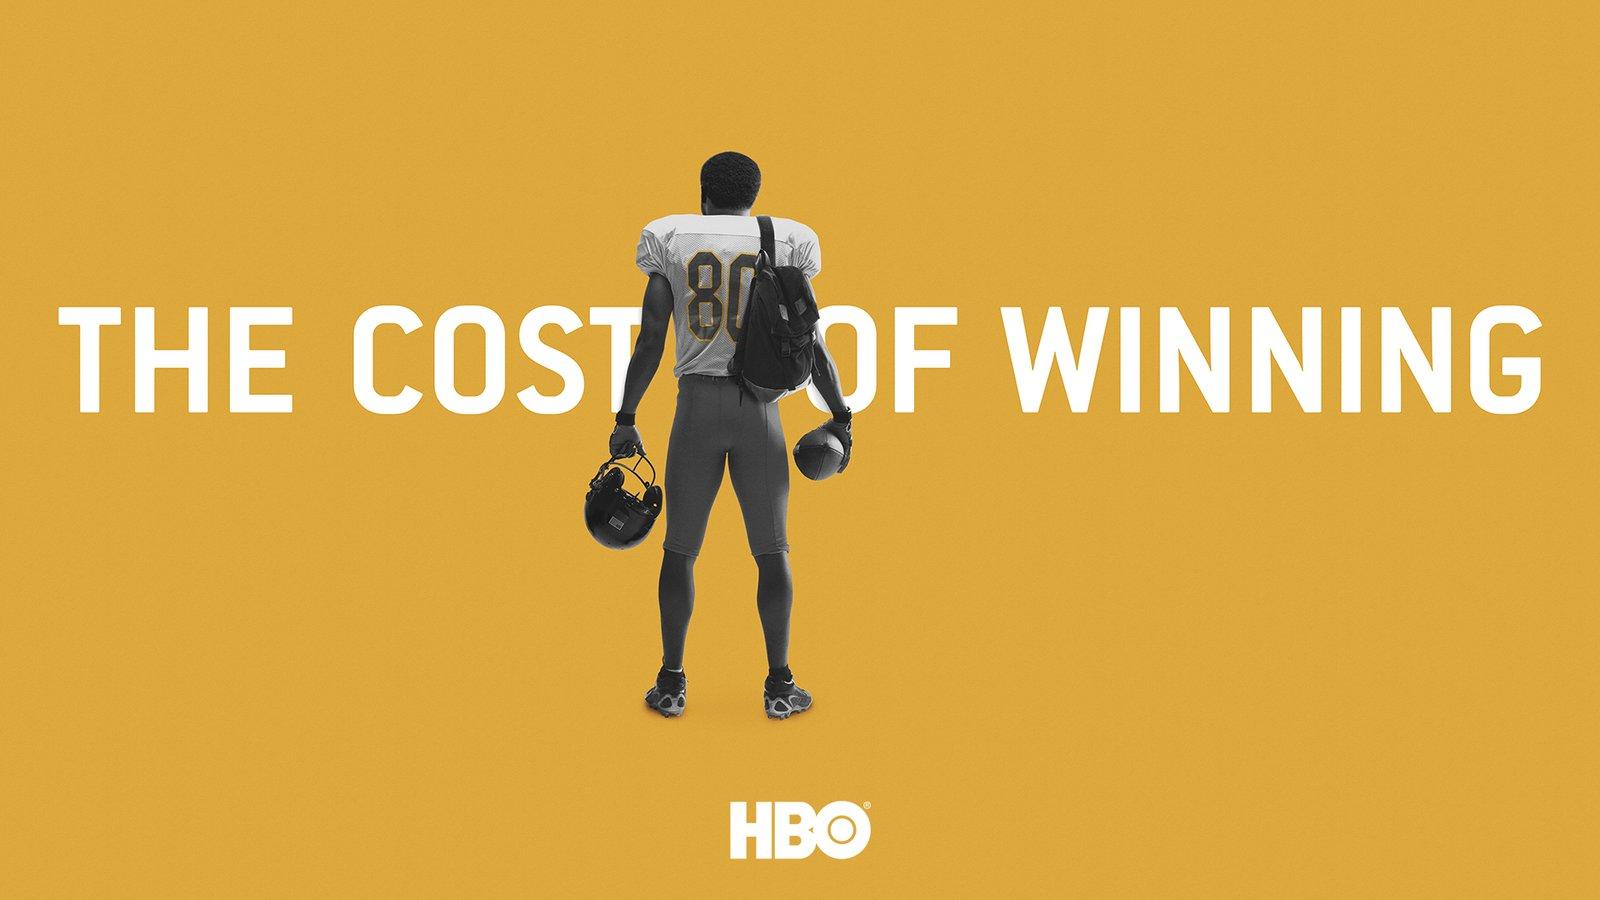 The Cost of Winning